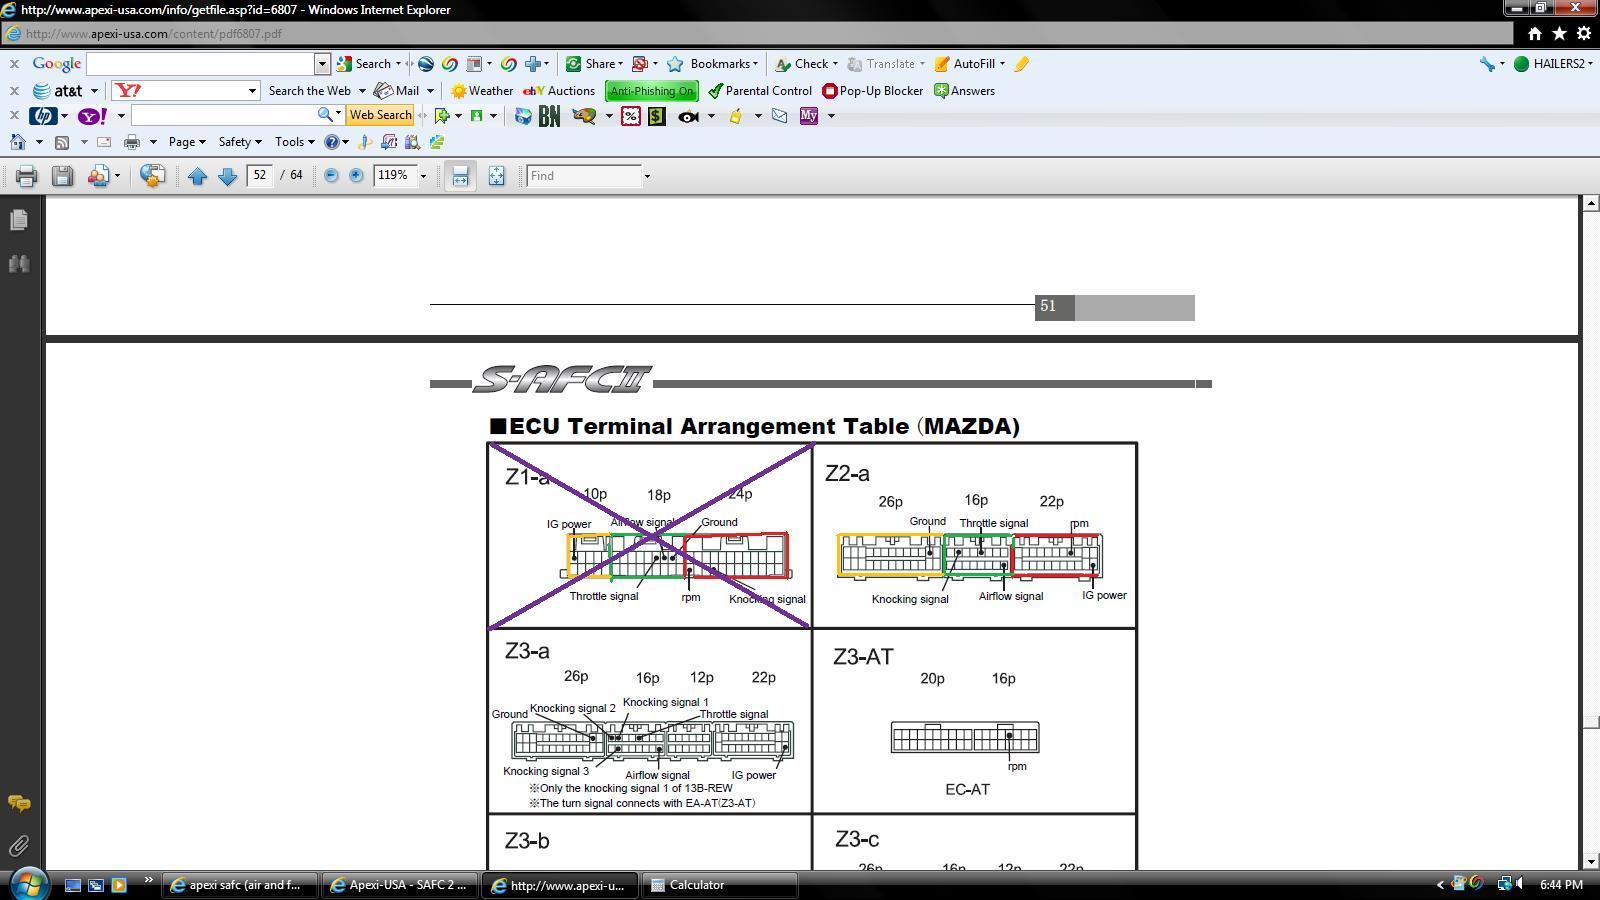 Dorable Apexi Safc Wiring Diagram Inspiration - Wiring Schematics ...